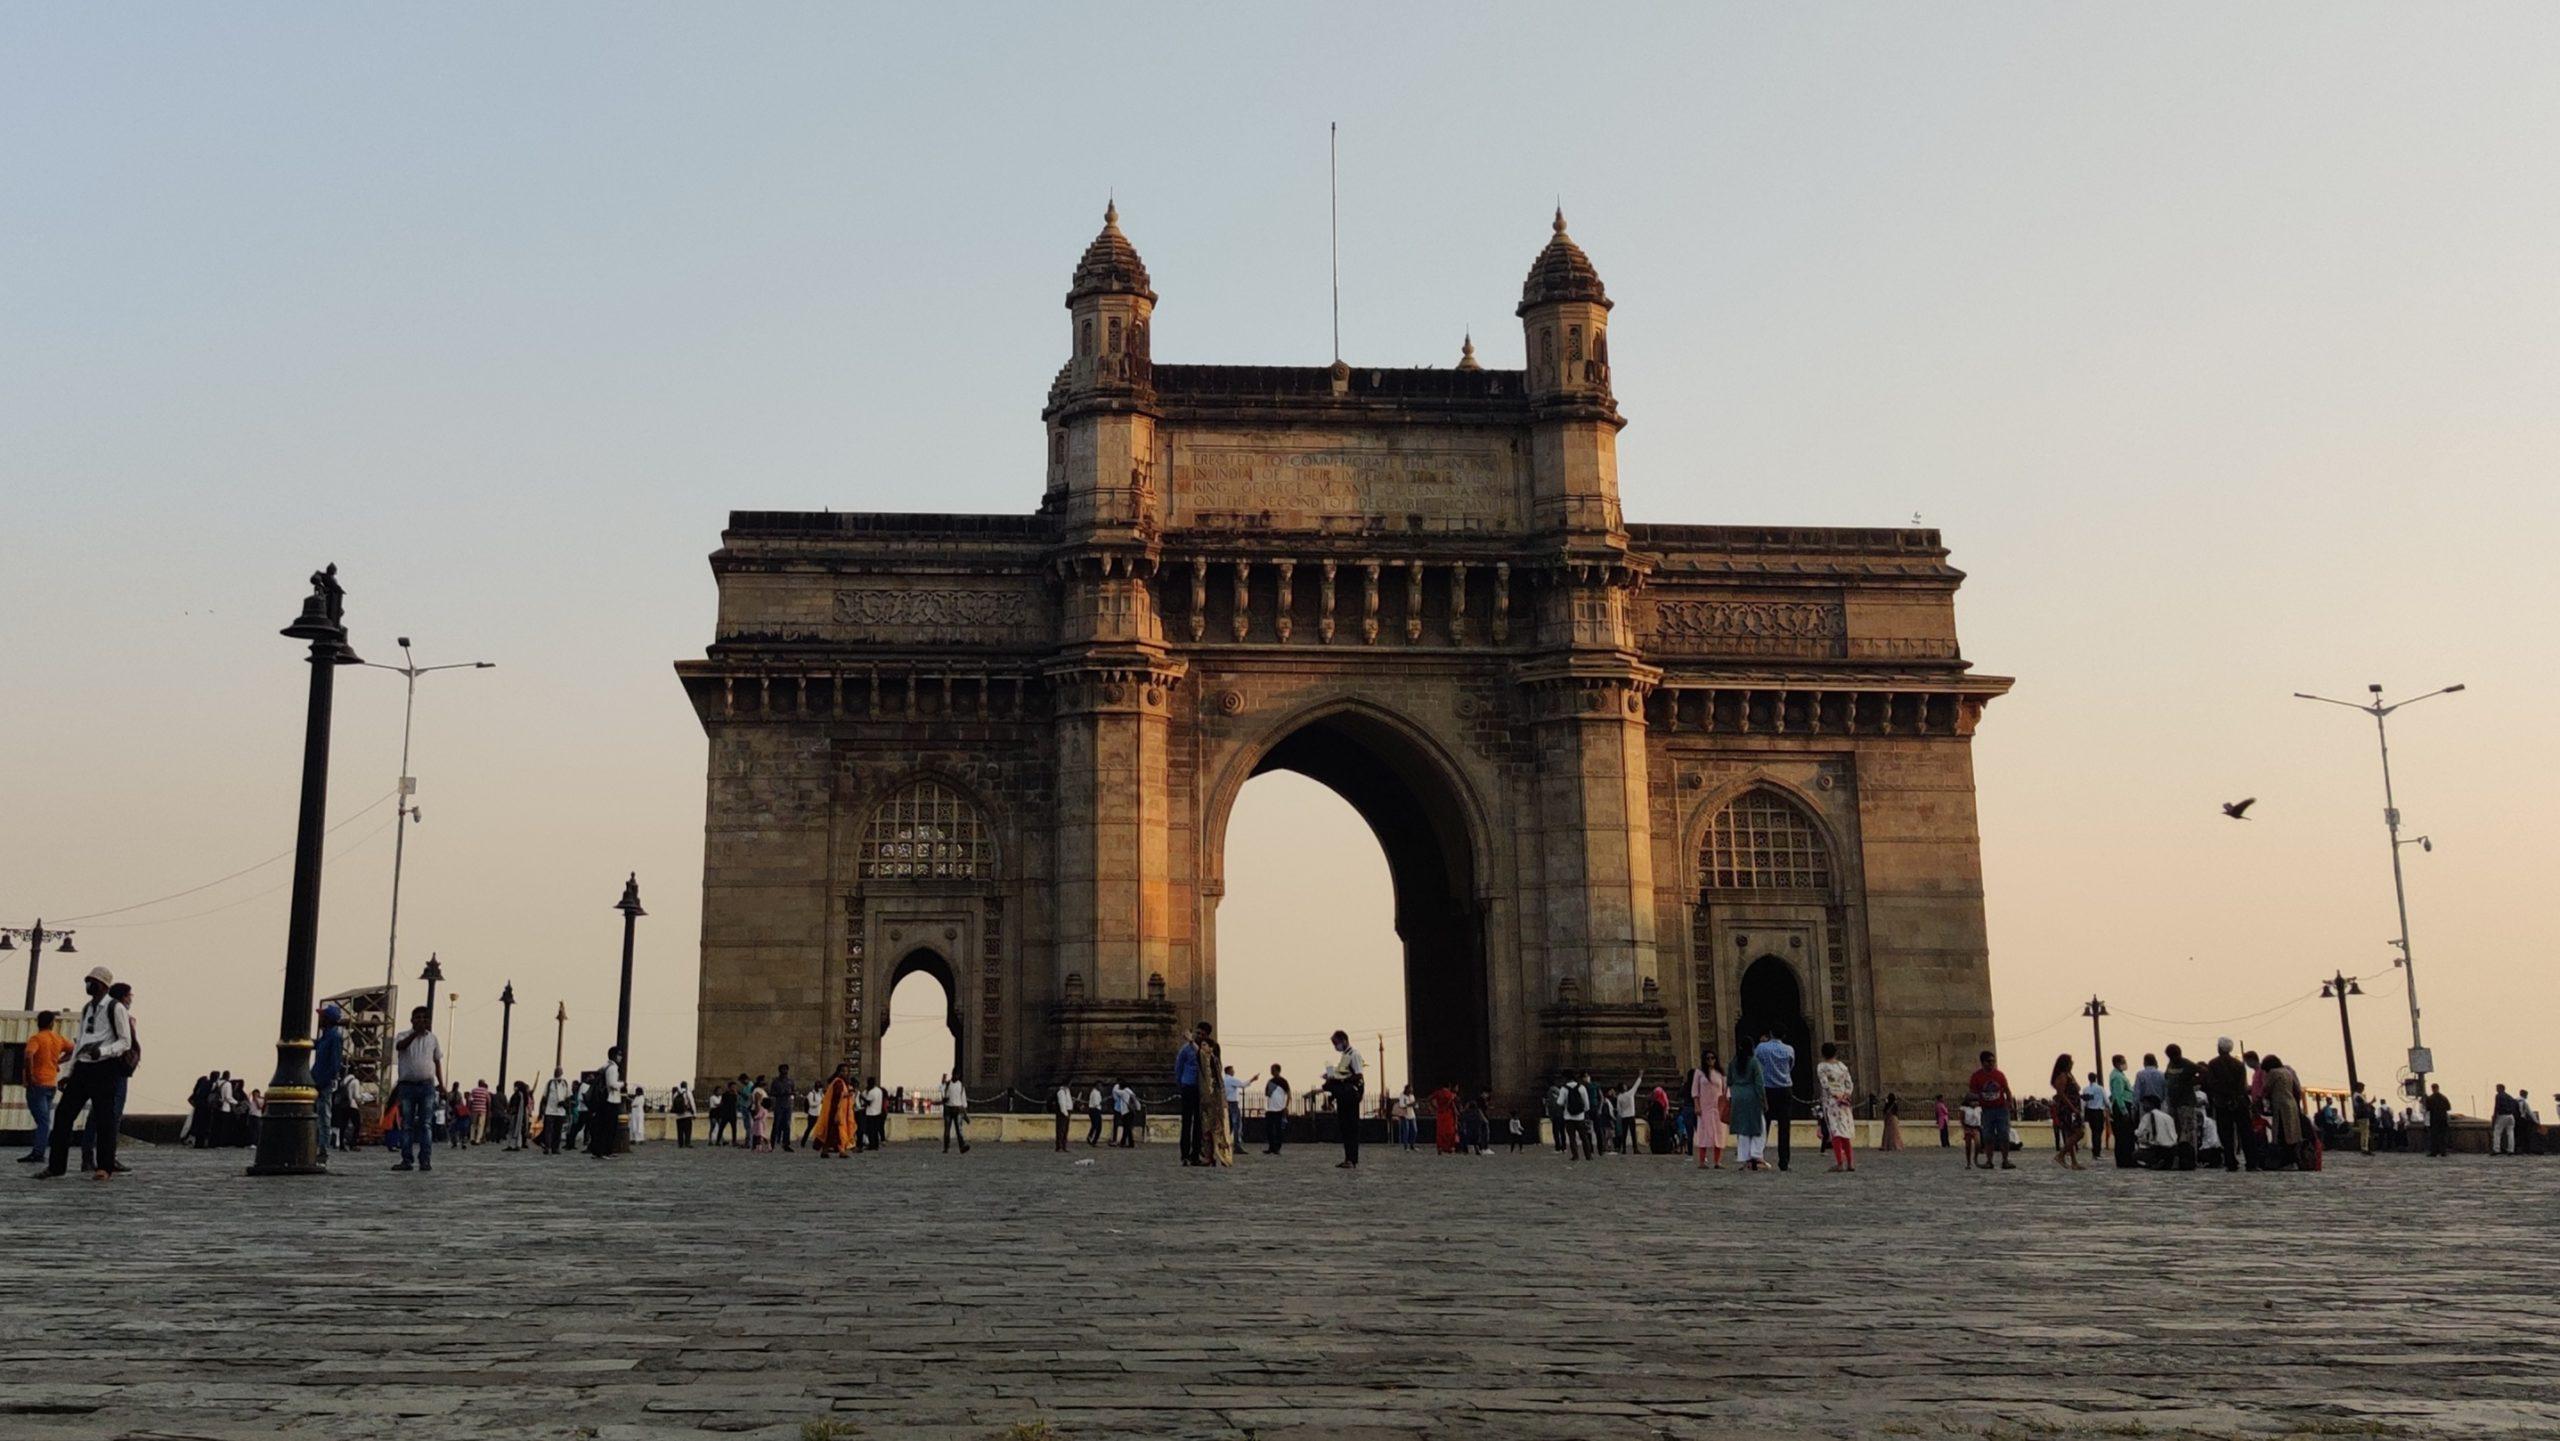 Gate way of India Mumbai